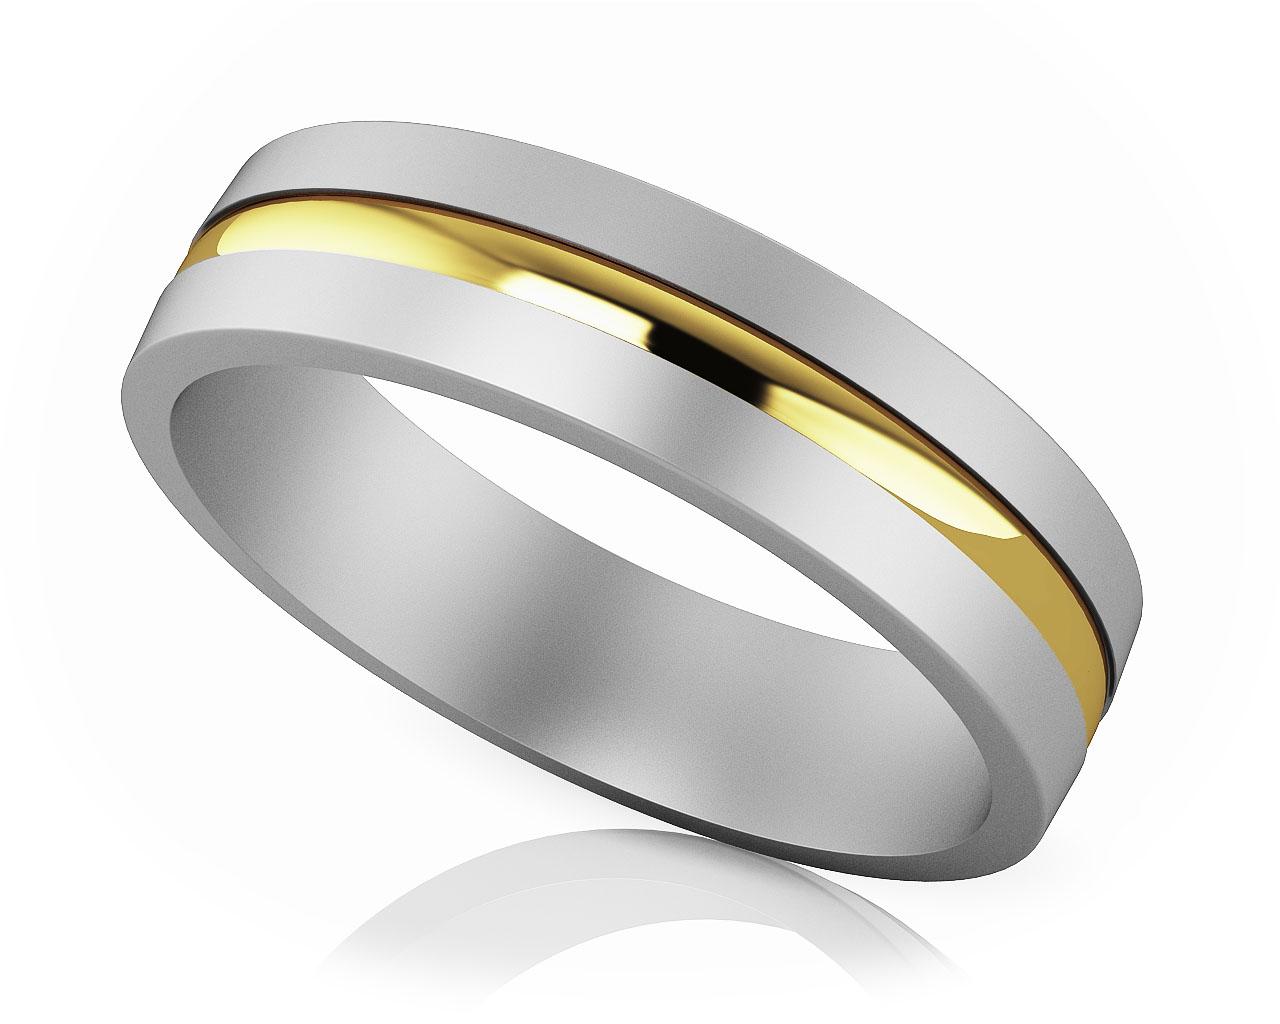 Modern Design Wedding Bands for Men and Women